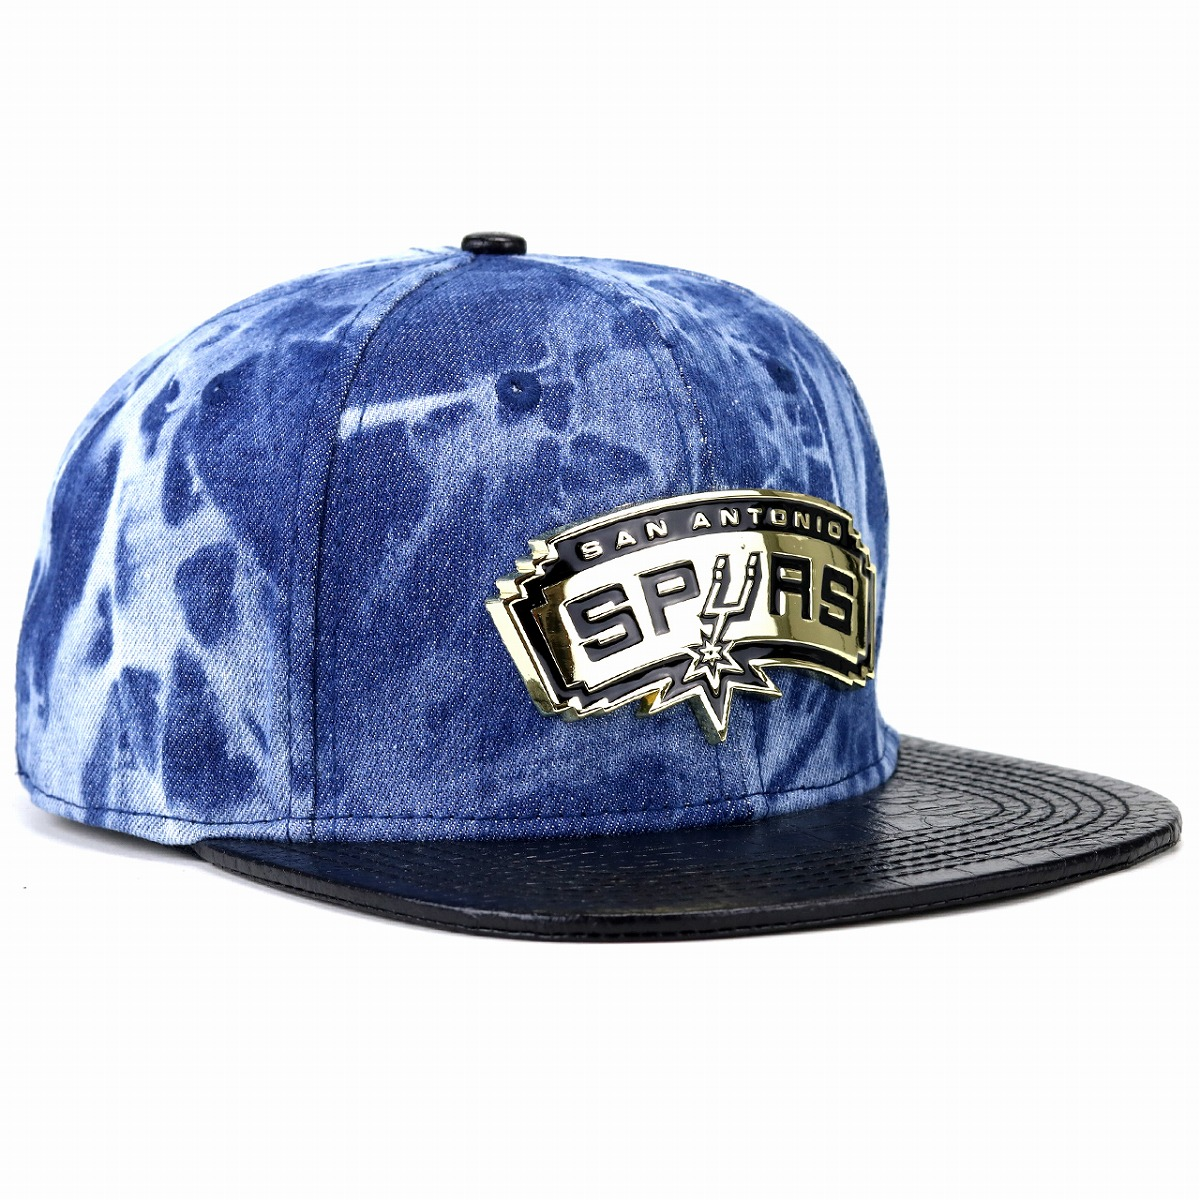 b98f234e866 Sun Ann Toni Spurs cap goods 3D solid logo plate embroidery professional  standard men gap Dis hat NBA SPURS TEAM Pro Standard baseball cap blue blue  ...